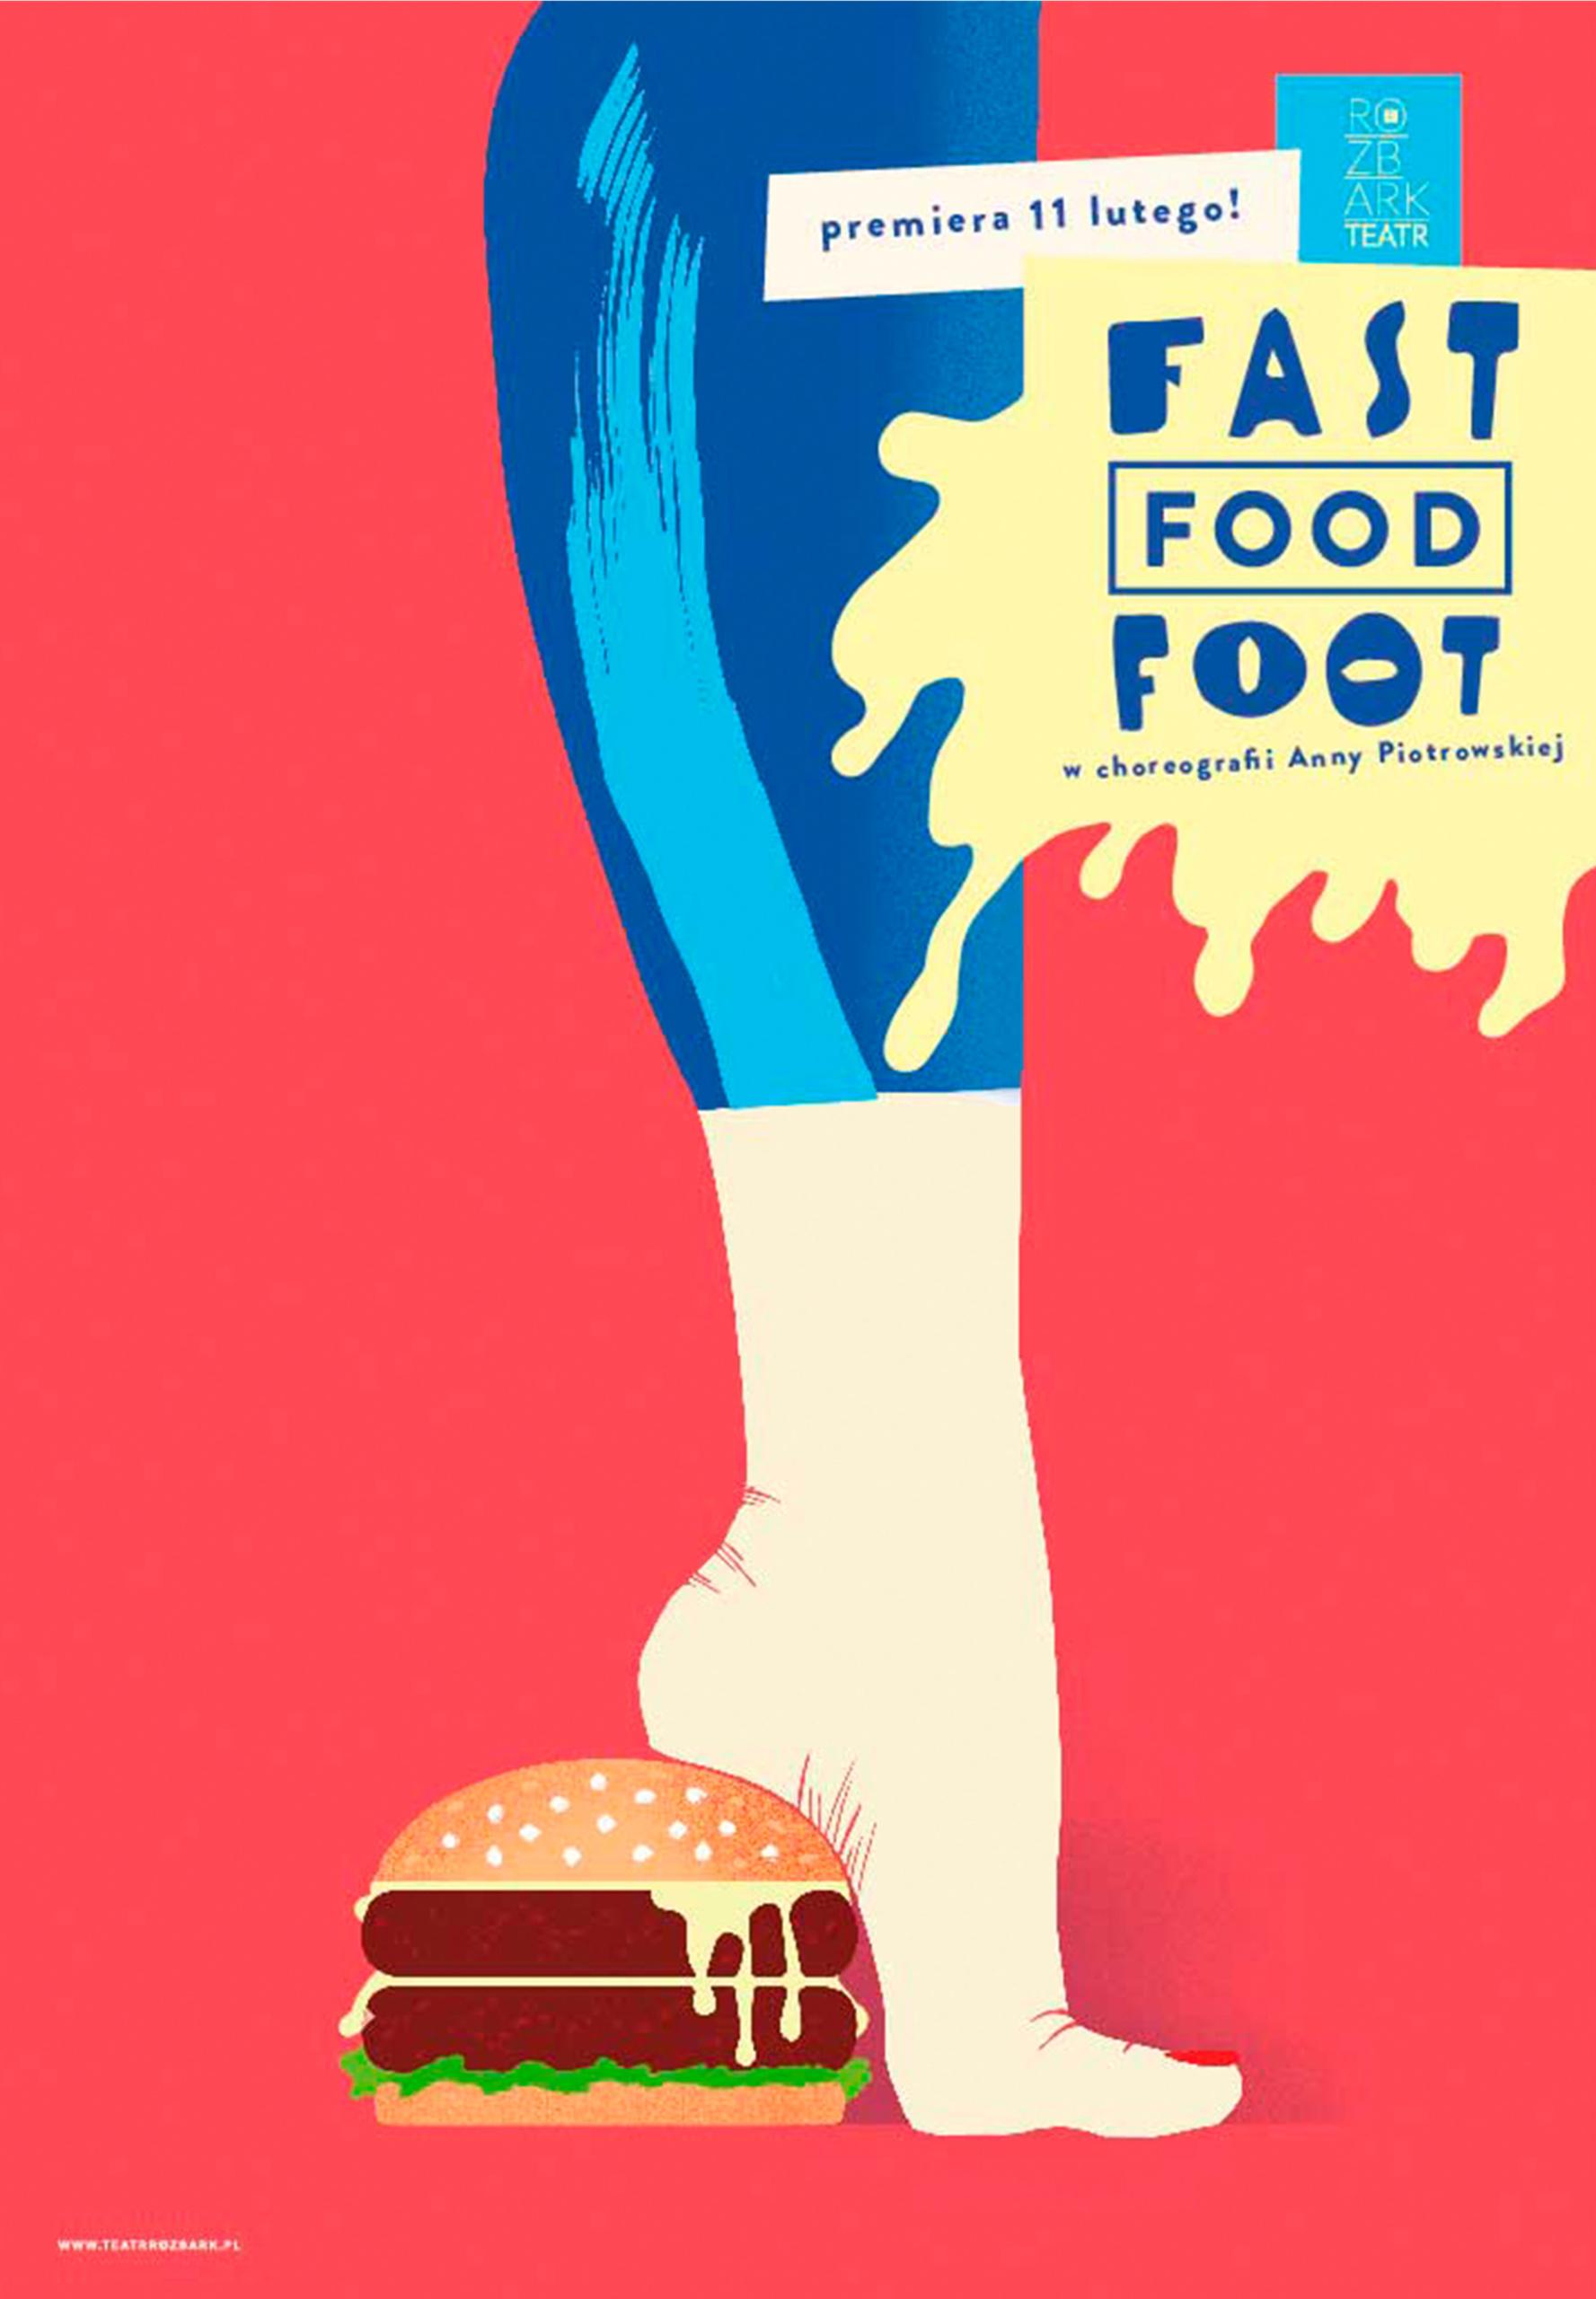 Fast Food Foot